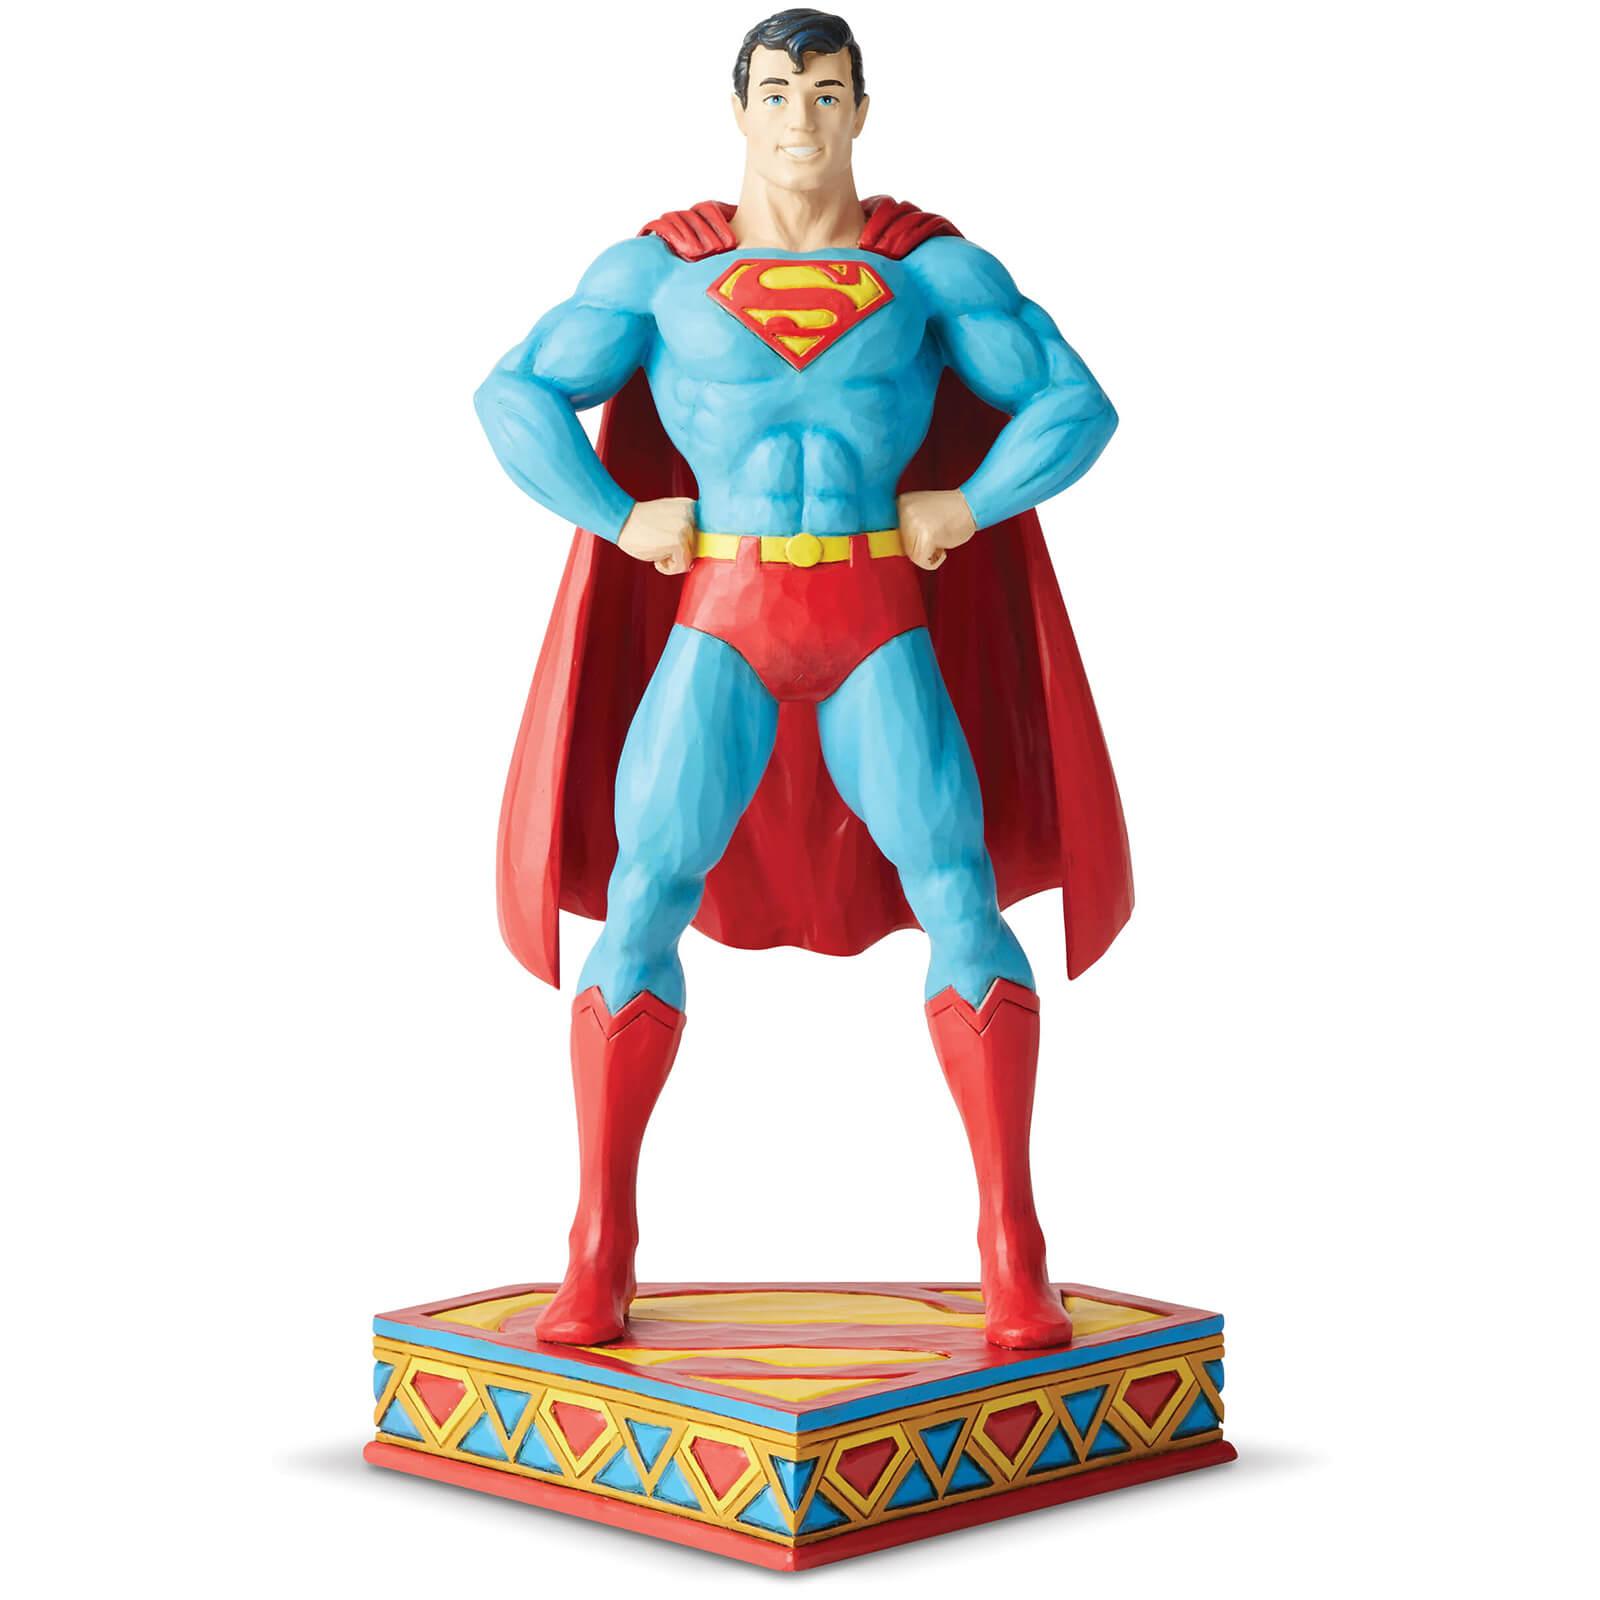 Image of DC Comics by Jim Shore Superman Silver Age Figurine 22.0cm